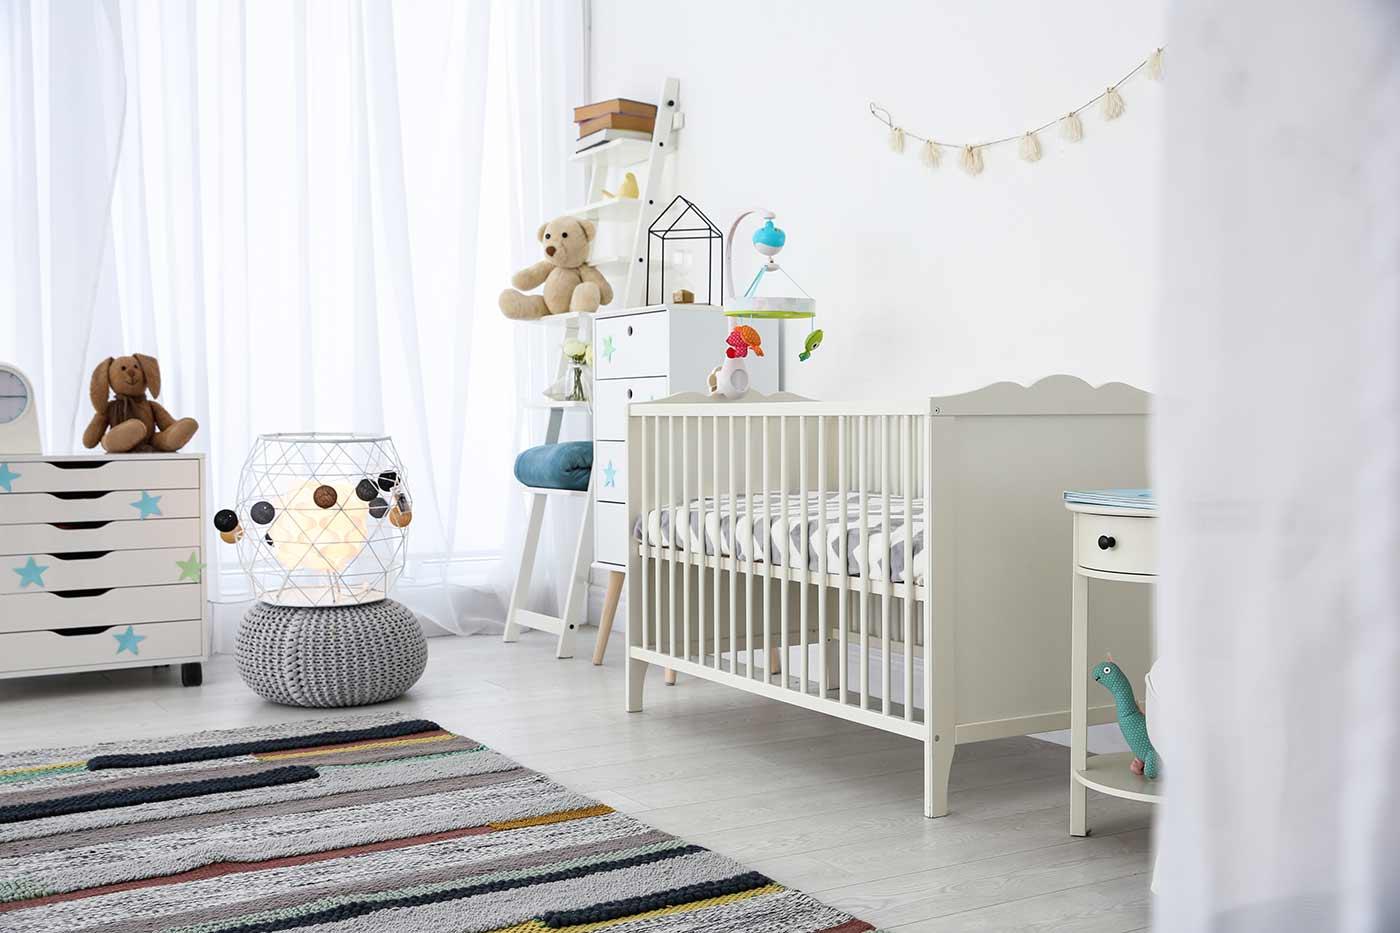 Nursery room with crib